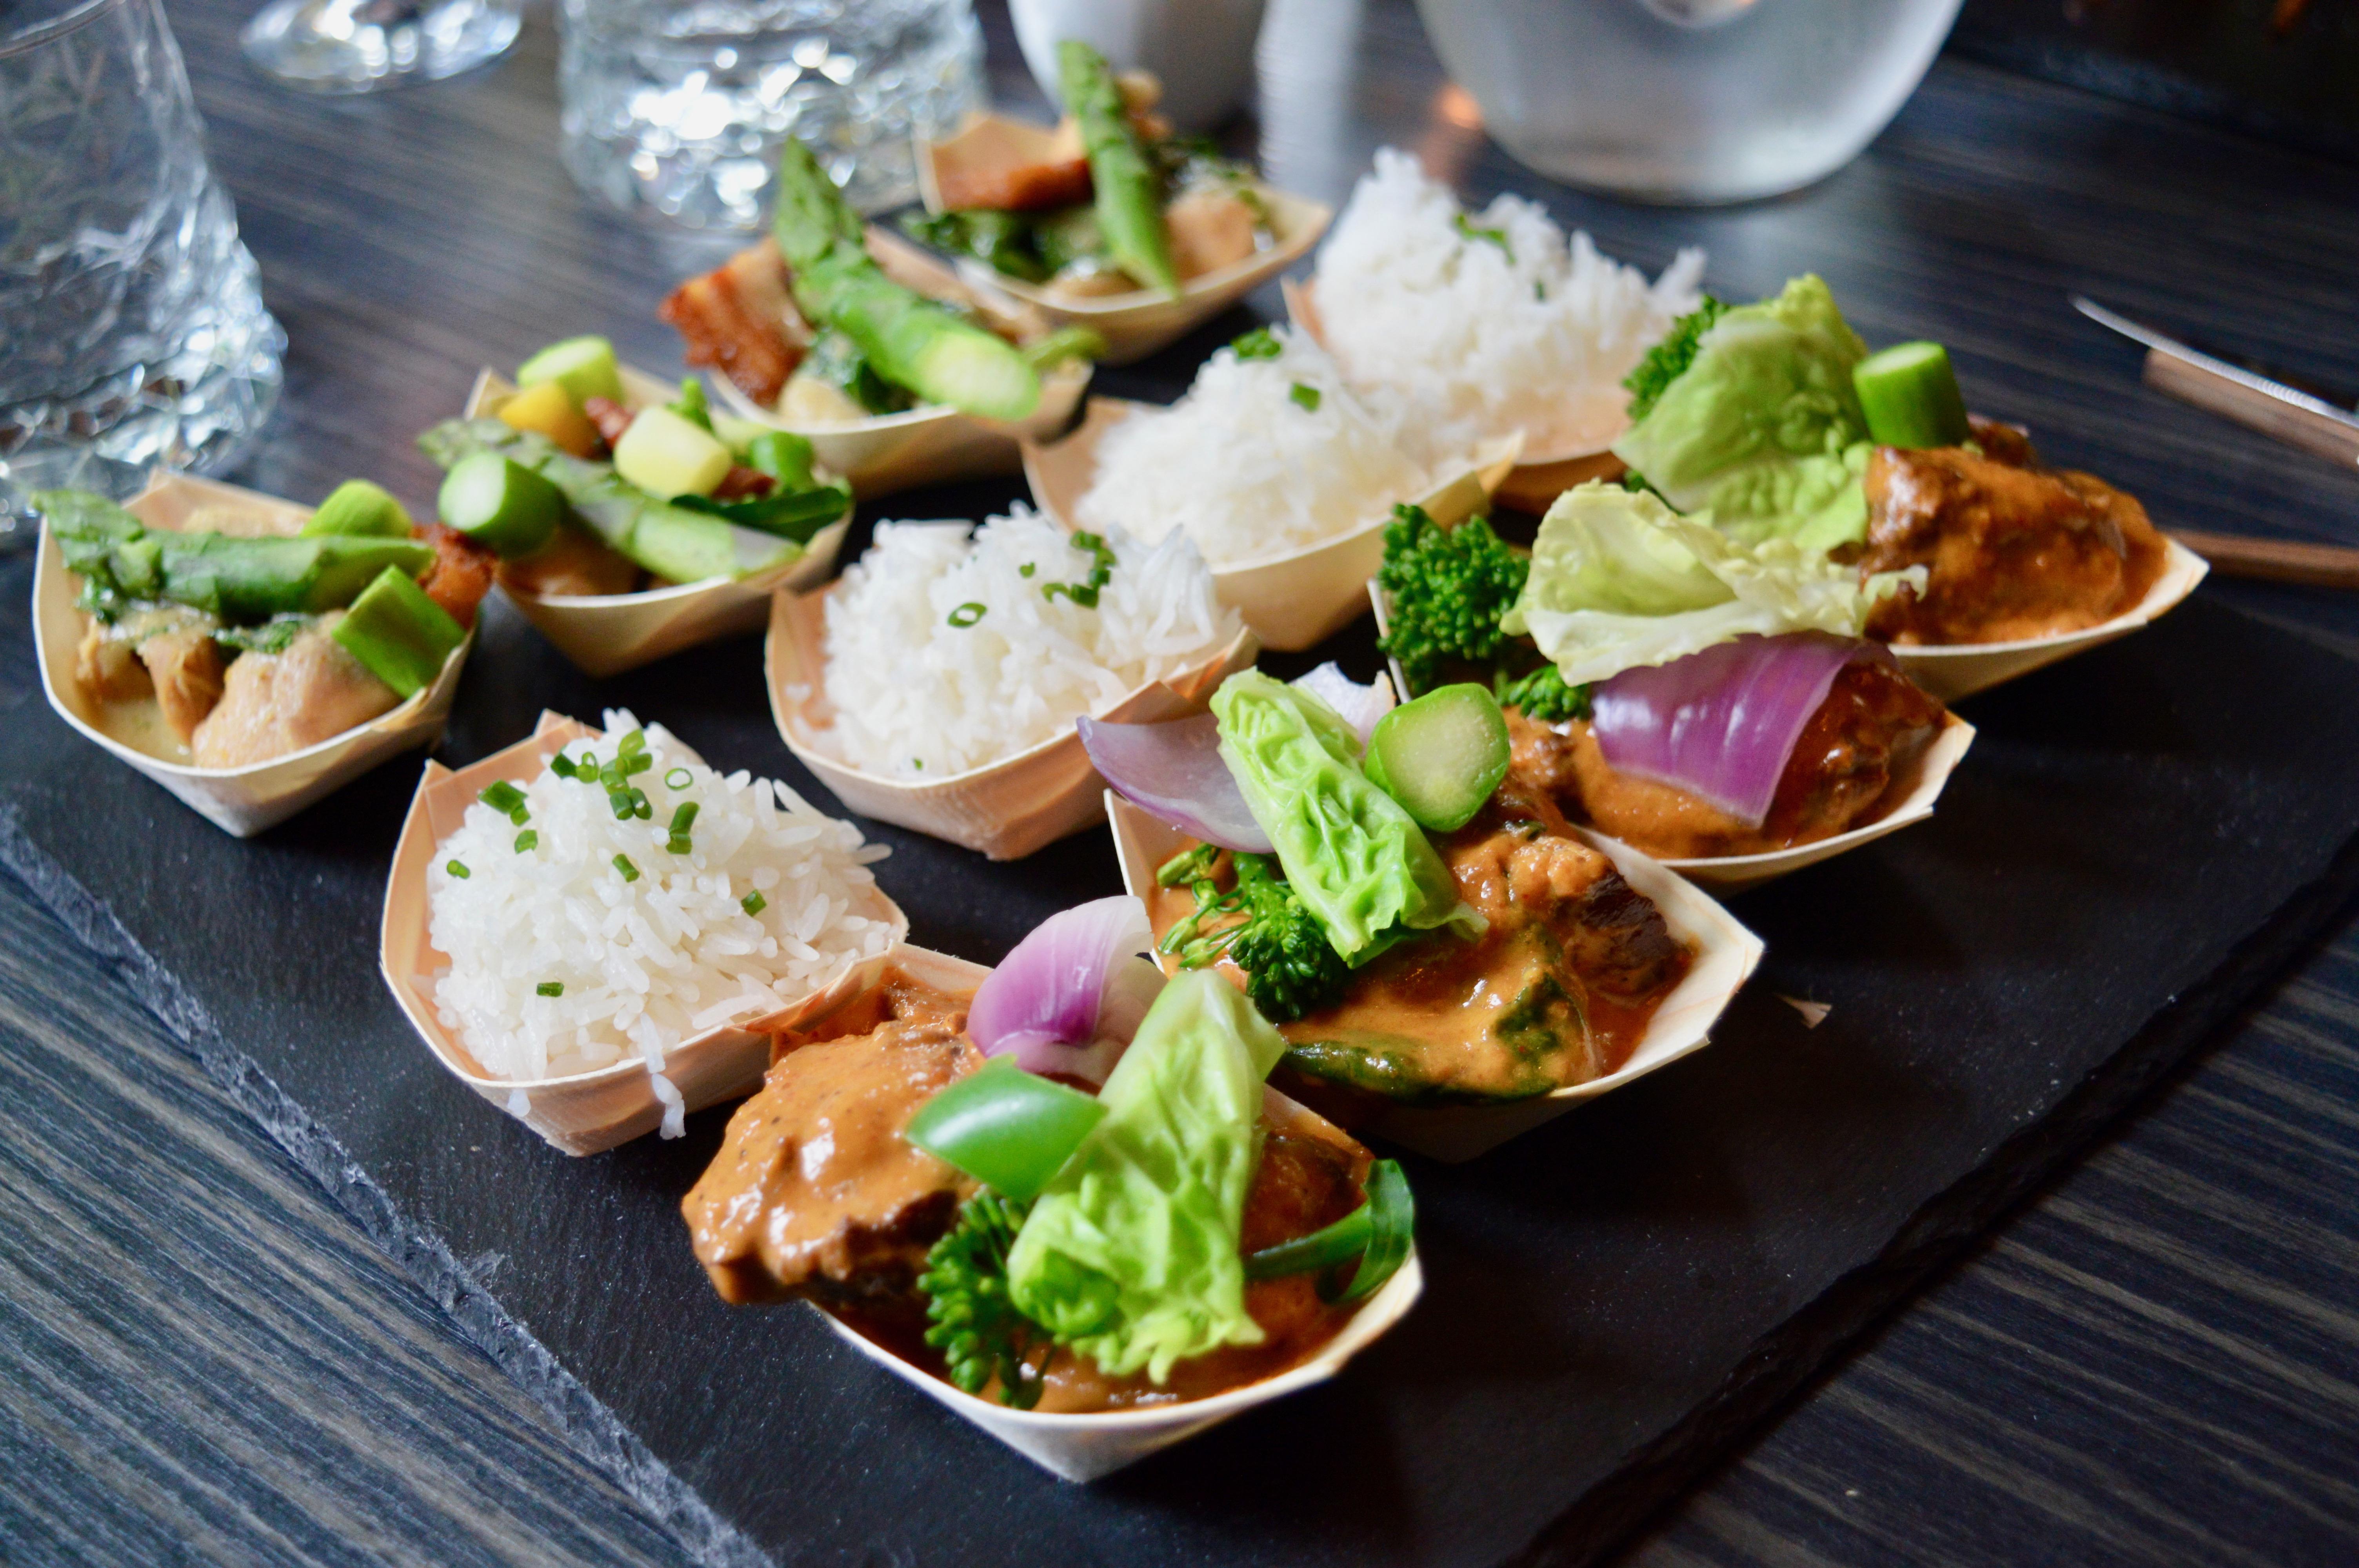 Curry-SoHe-Cocktail-Bar-Asian-Restaurant-Jesmond-Newcastle-Elle-Blonde-Luxury-Lifestyle-Blog